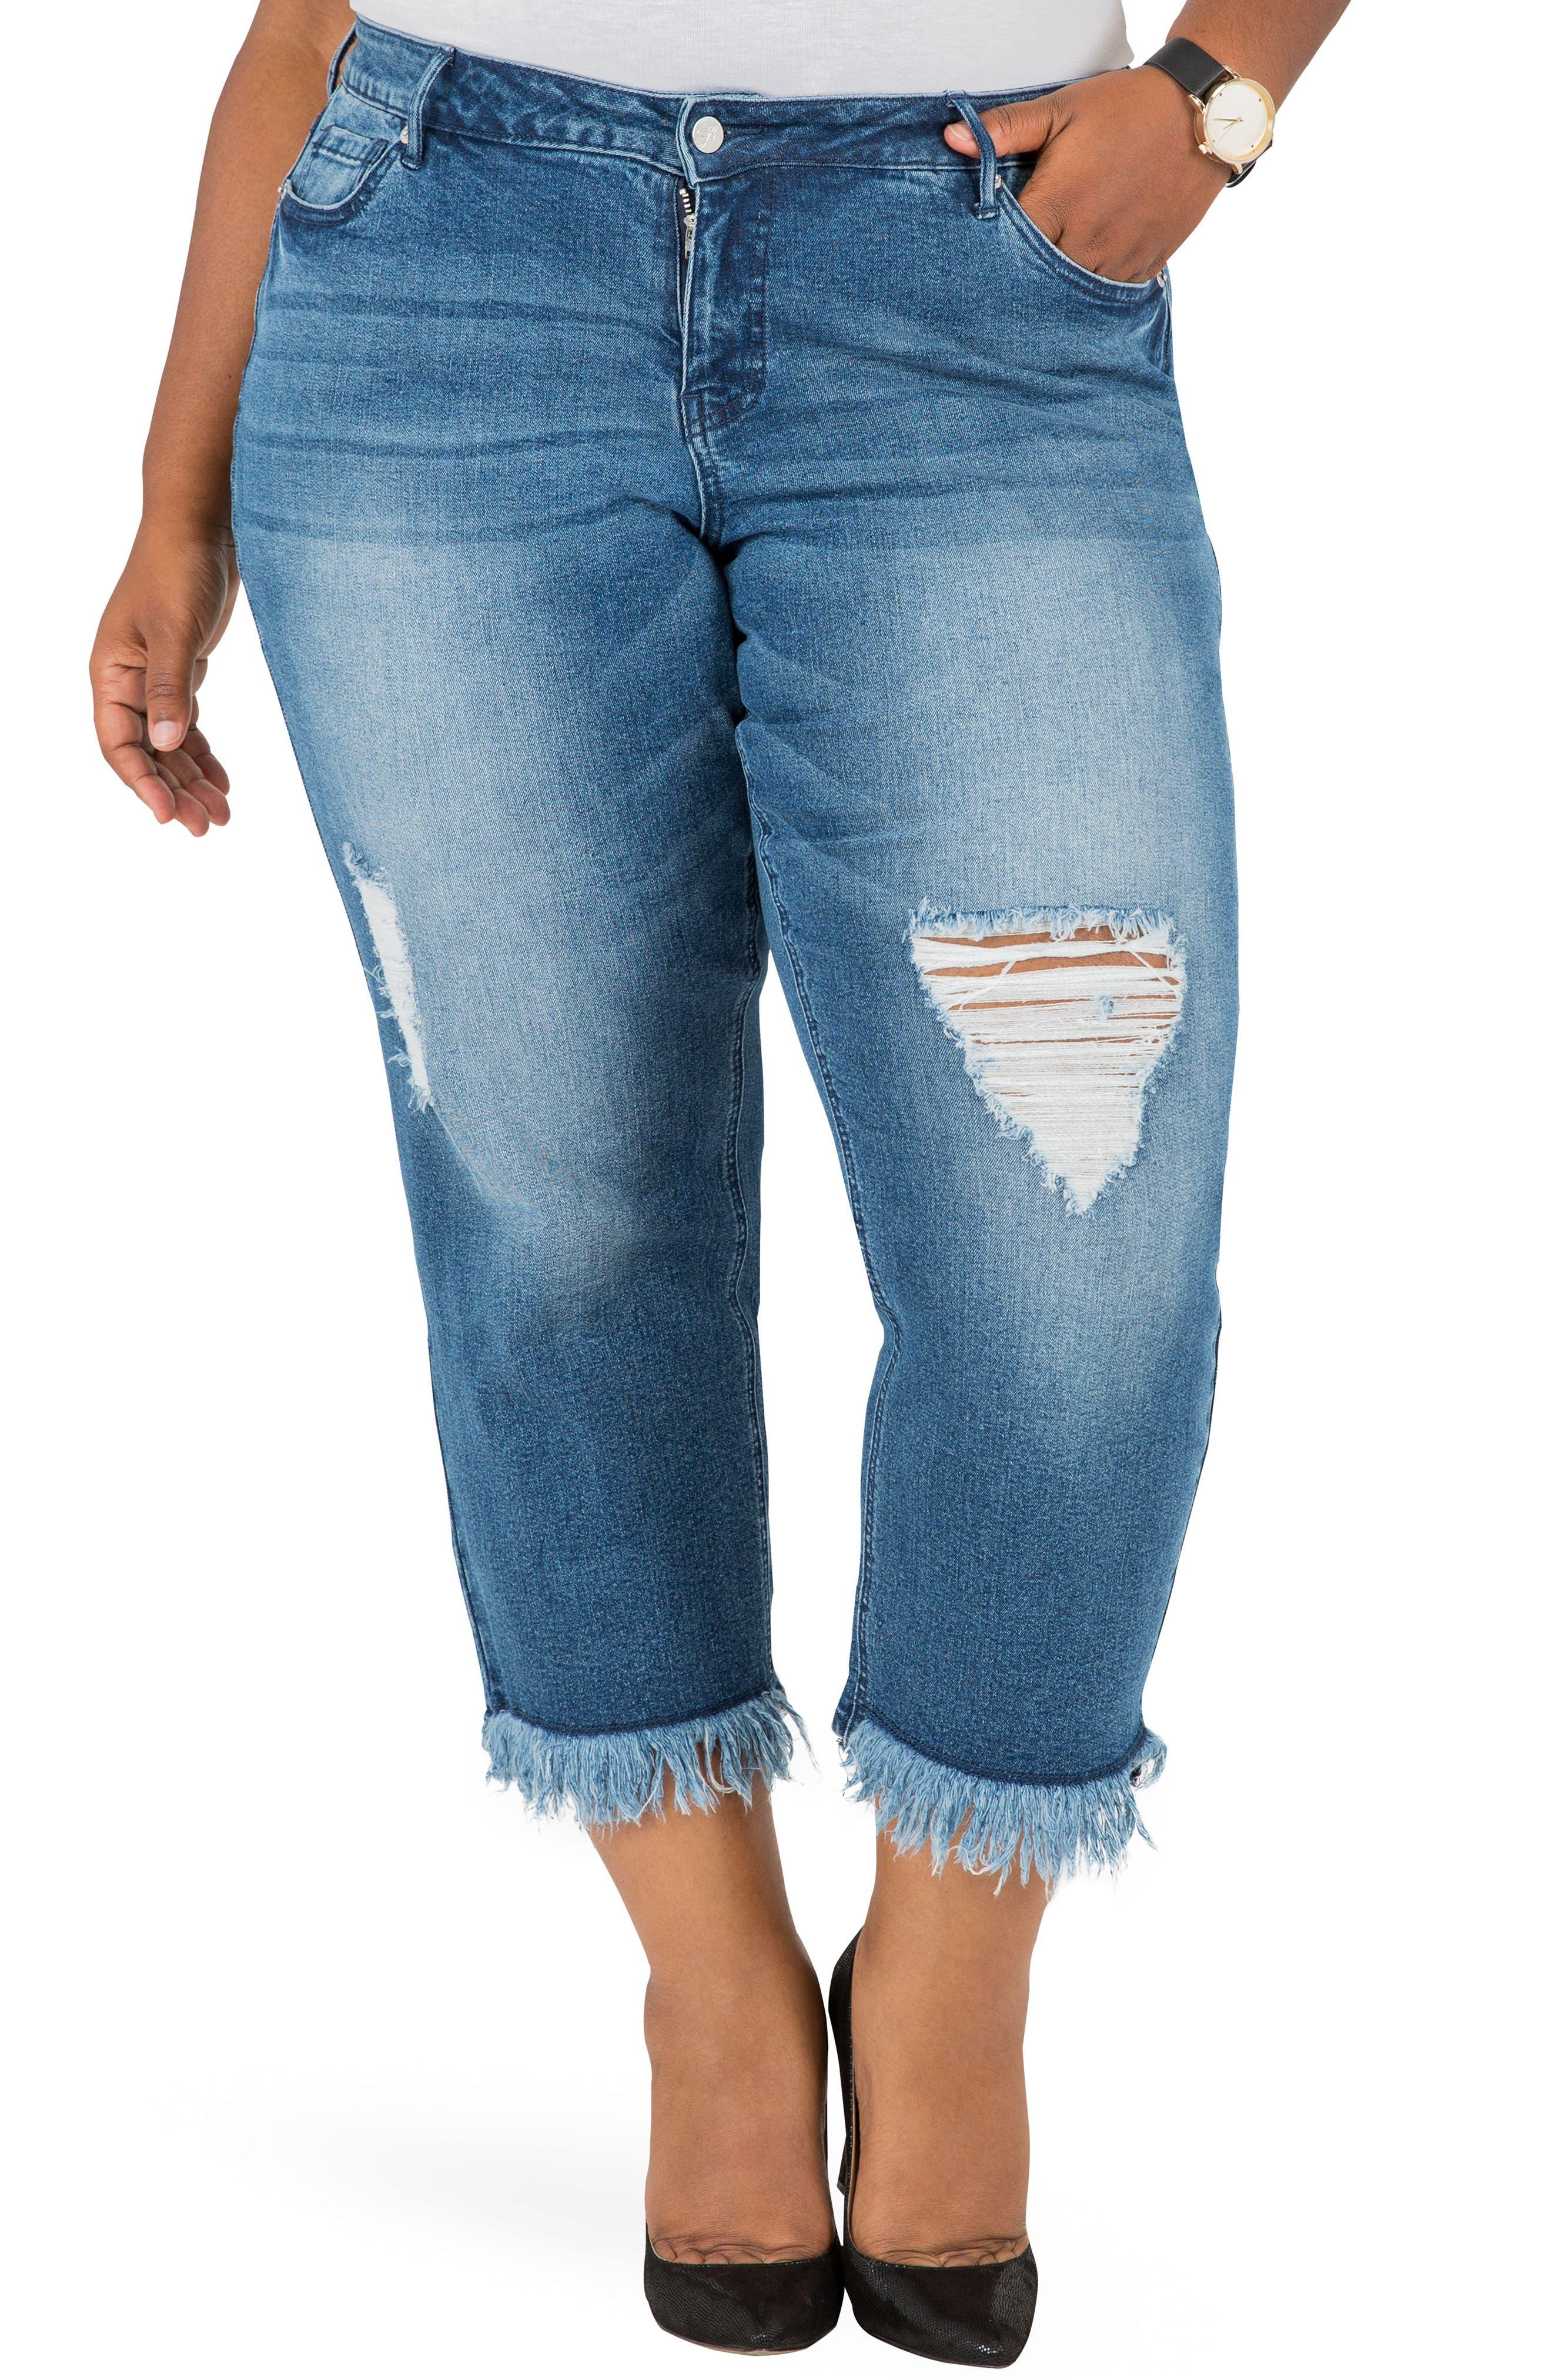 Verla Frayed Hem Crop Boyfriend Jeans,                             Main thumbnail 1, color,                             LIGHT BLUE